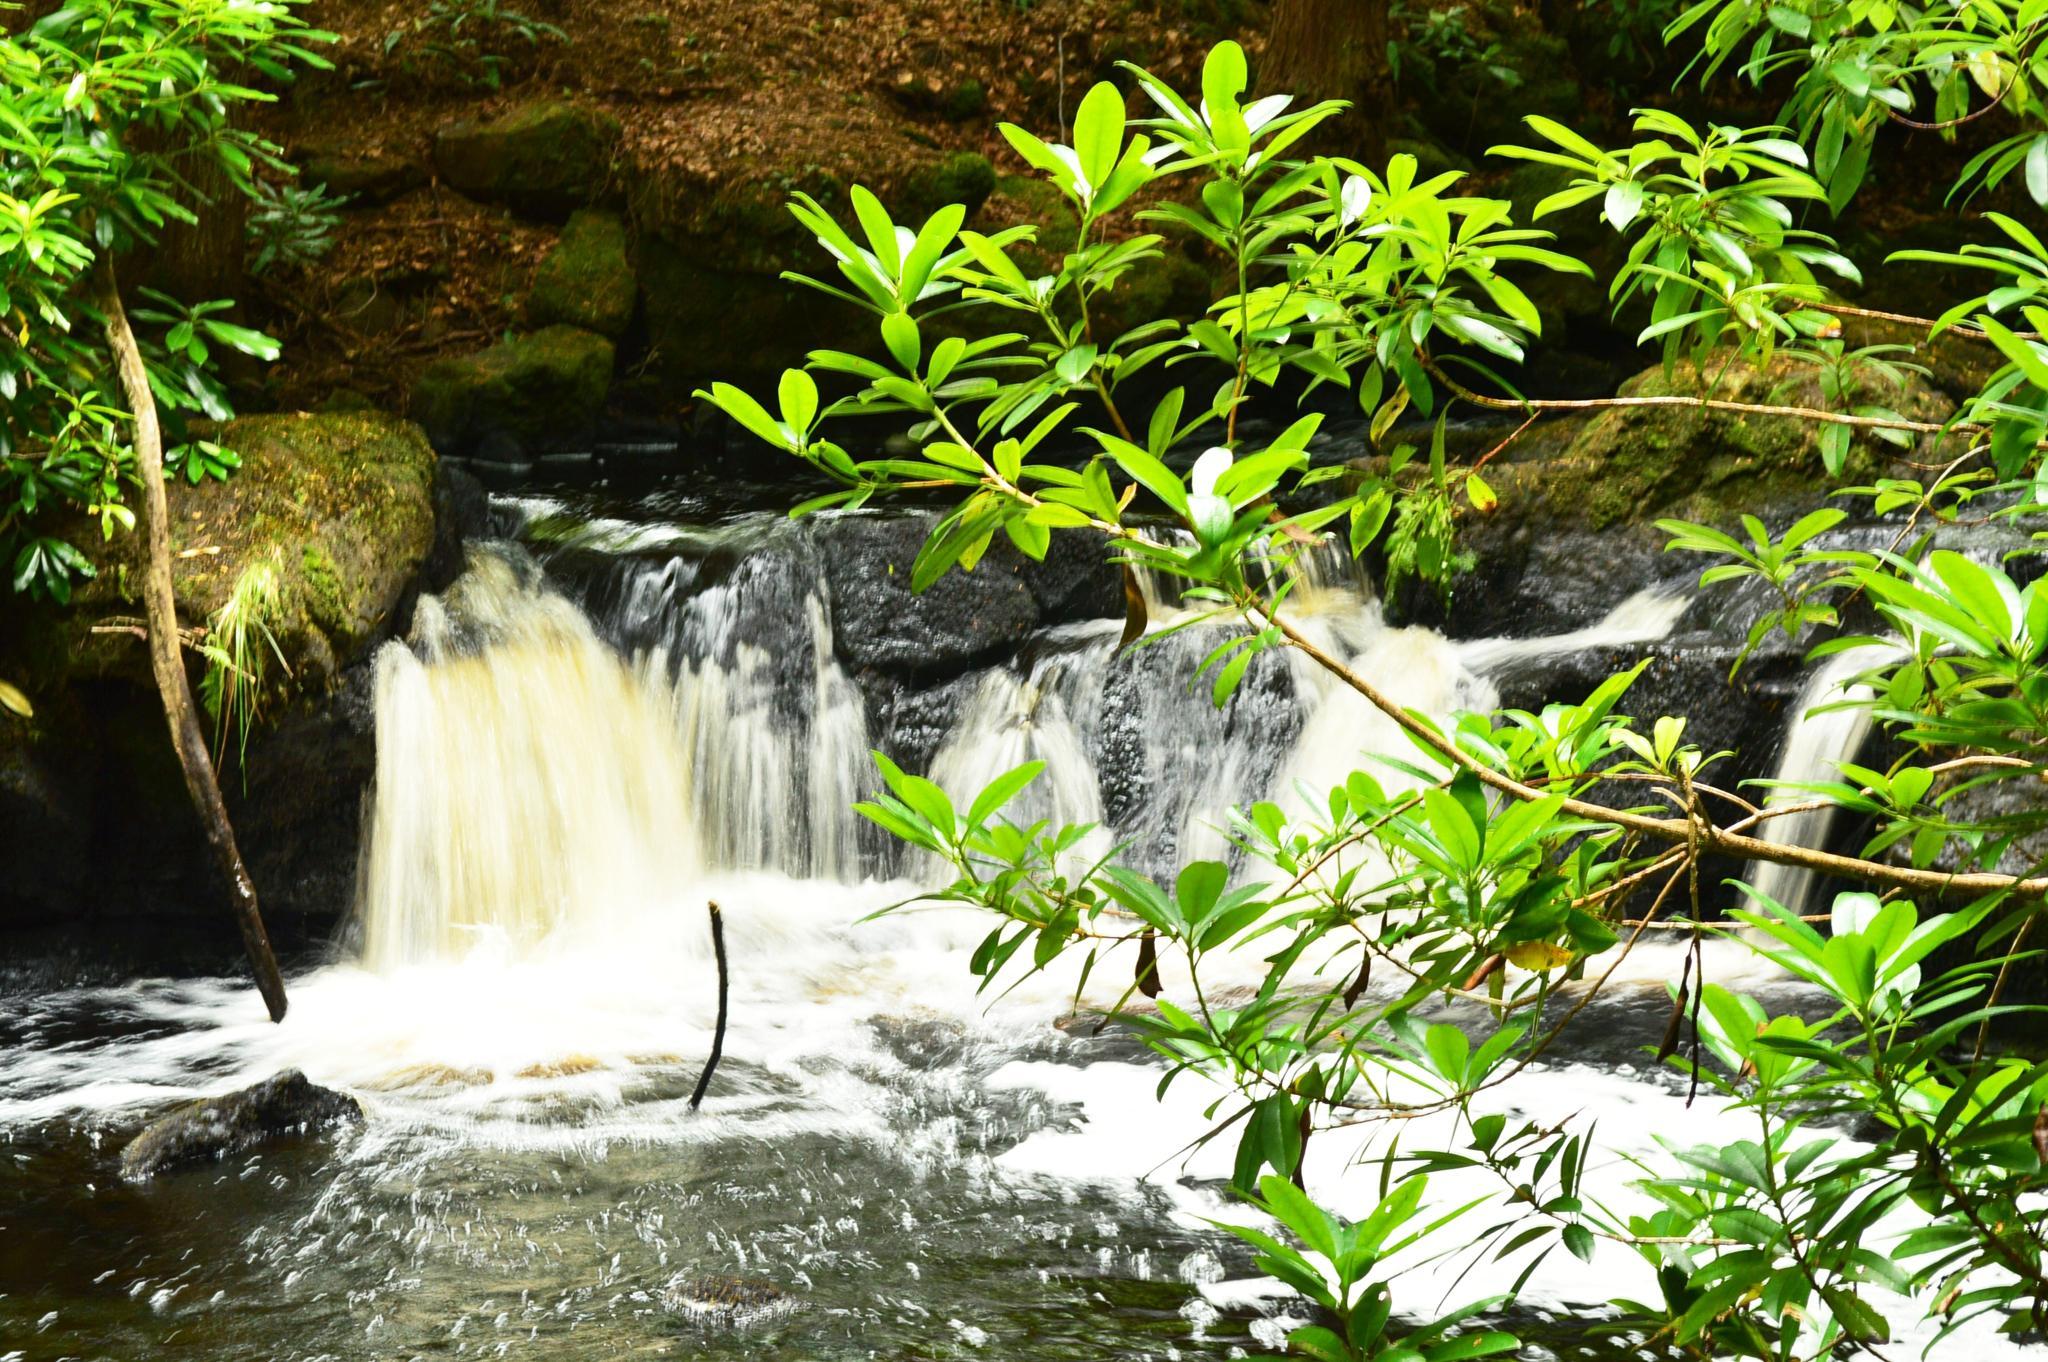 Waterfall by andrewwalker14